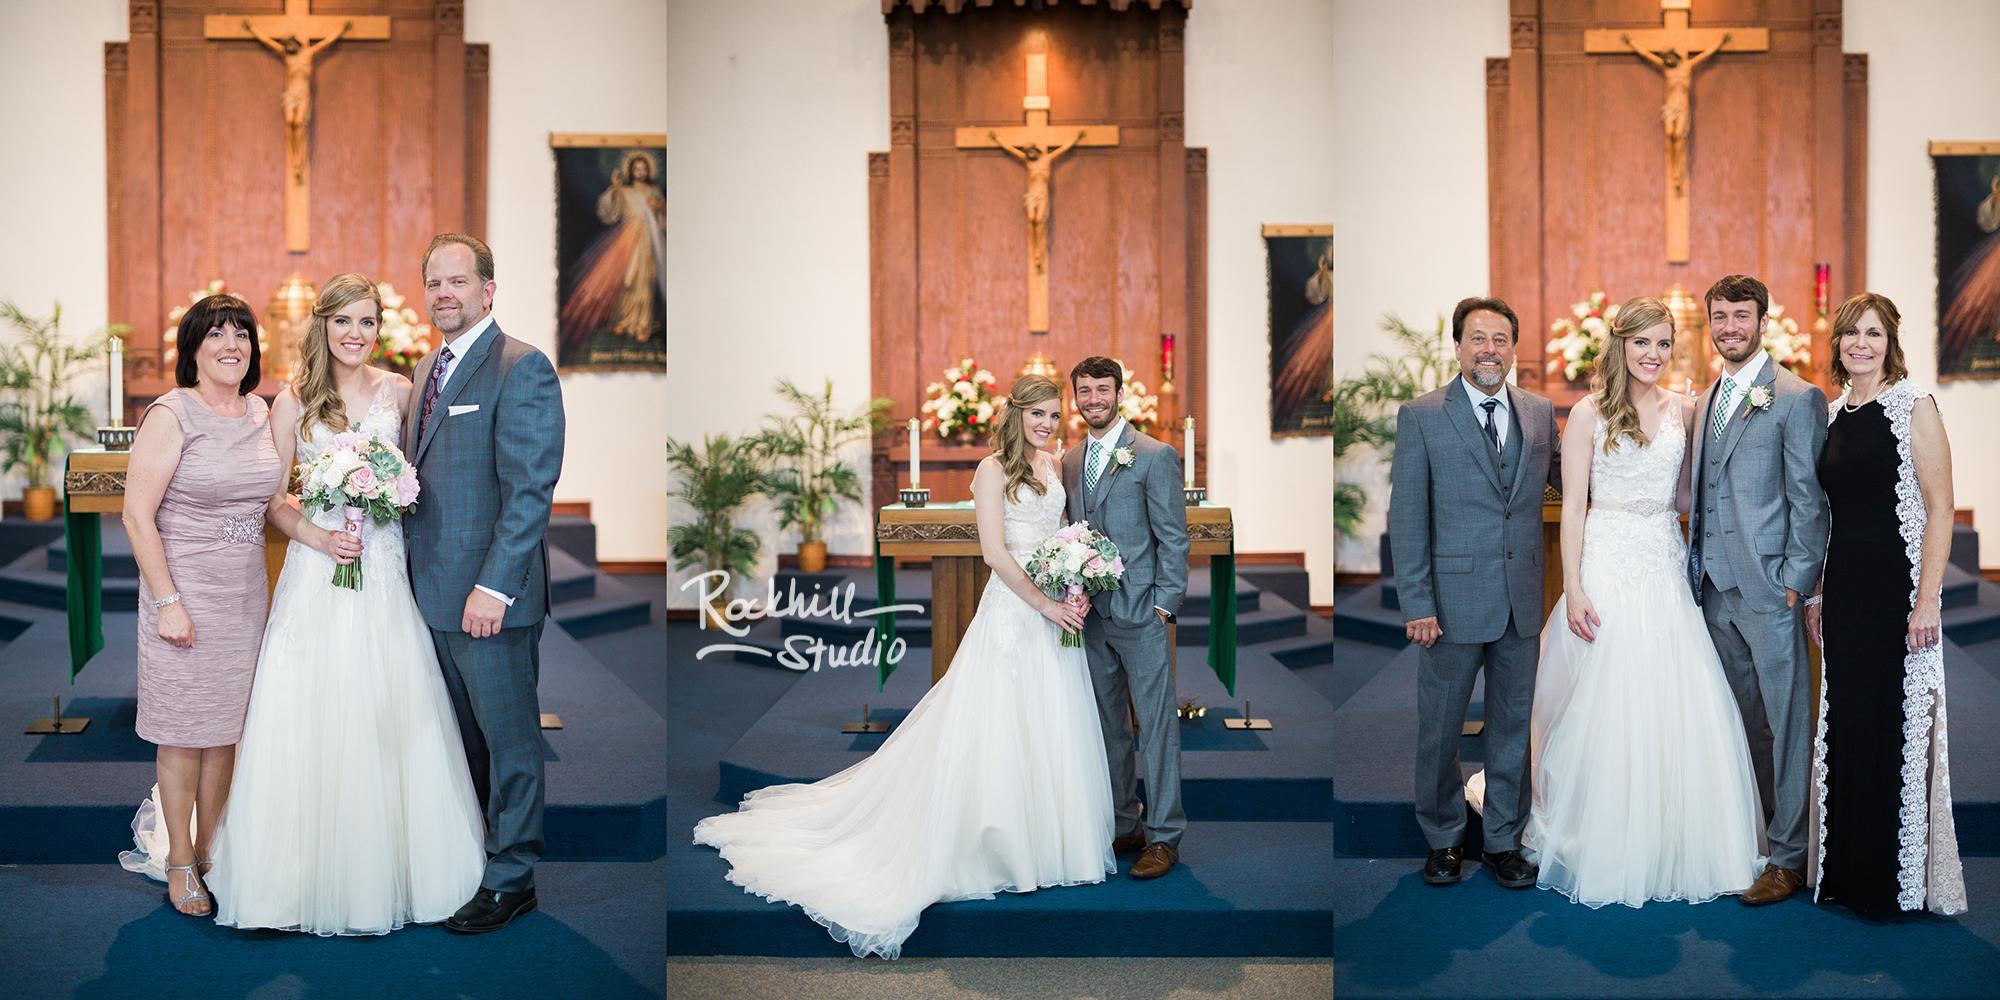 newberry-michigan-wedding-upper-peninsula-spring-photography-rockhill-ee-25.jpg